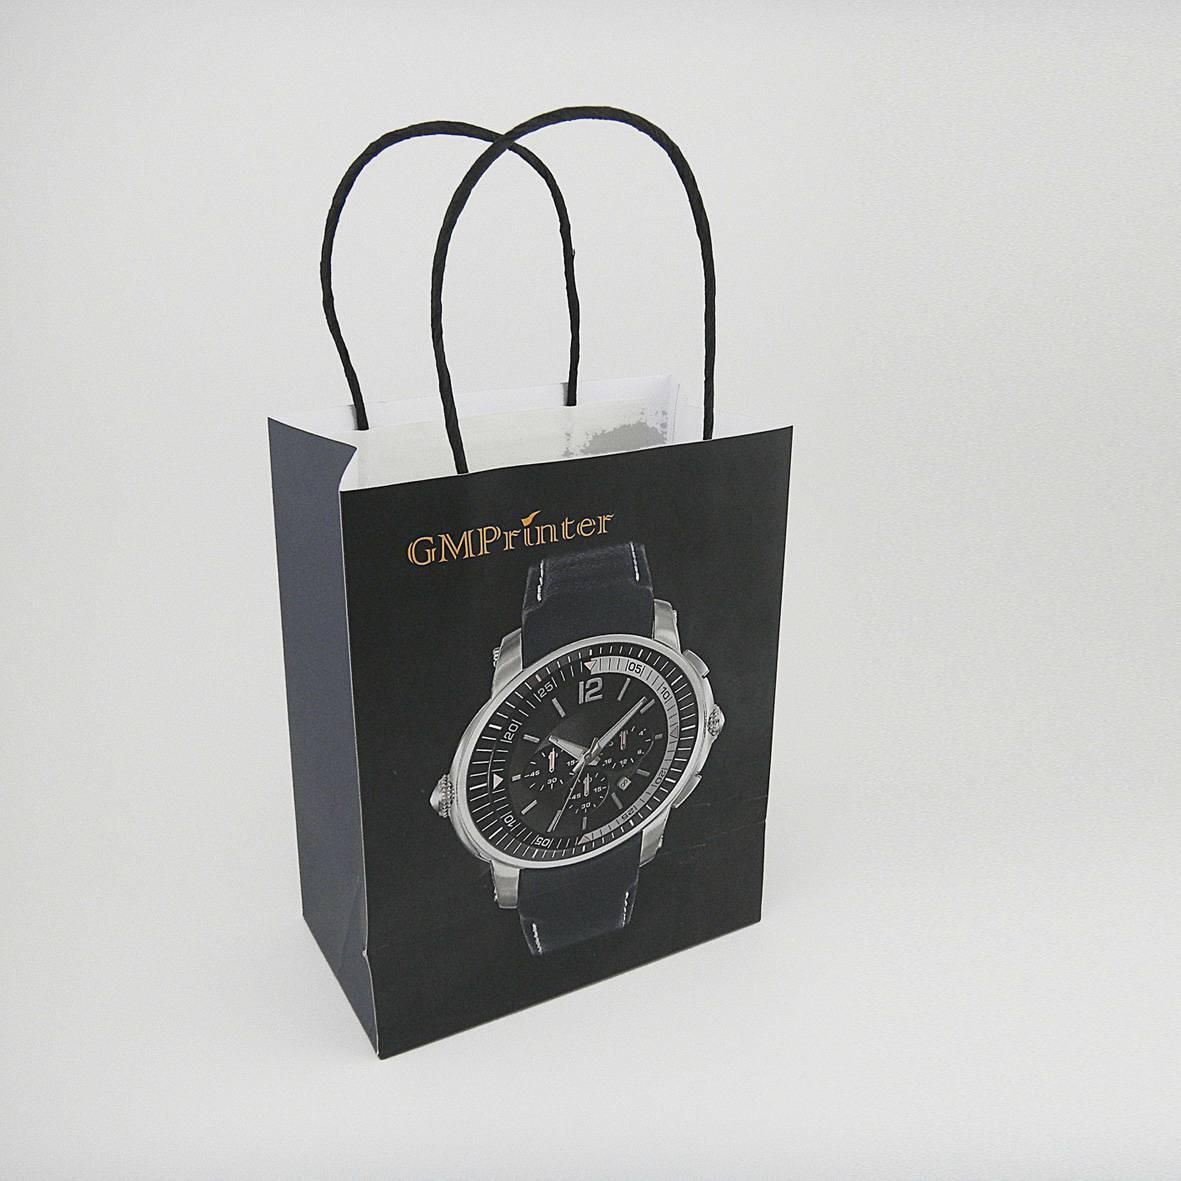 Retail paper bags